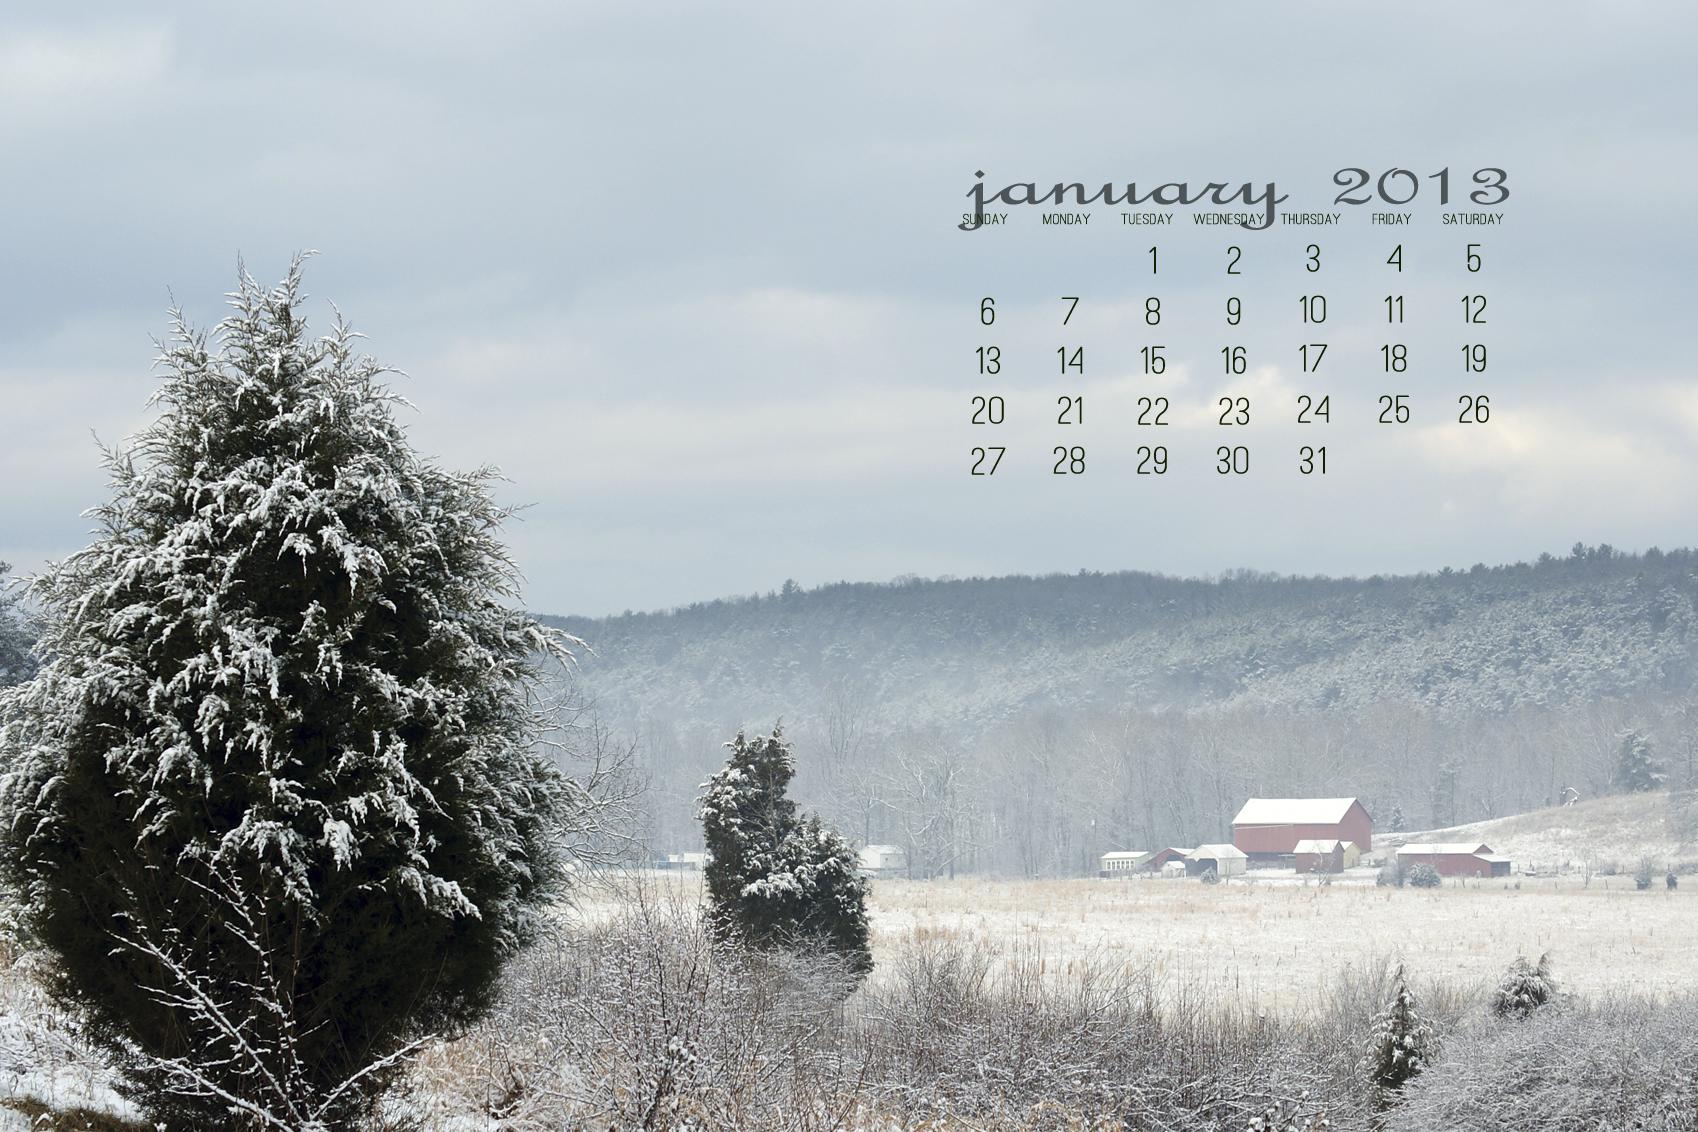 January Calendar Wallpapers January 2016 Wallpaper With Calendar 1698x1132